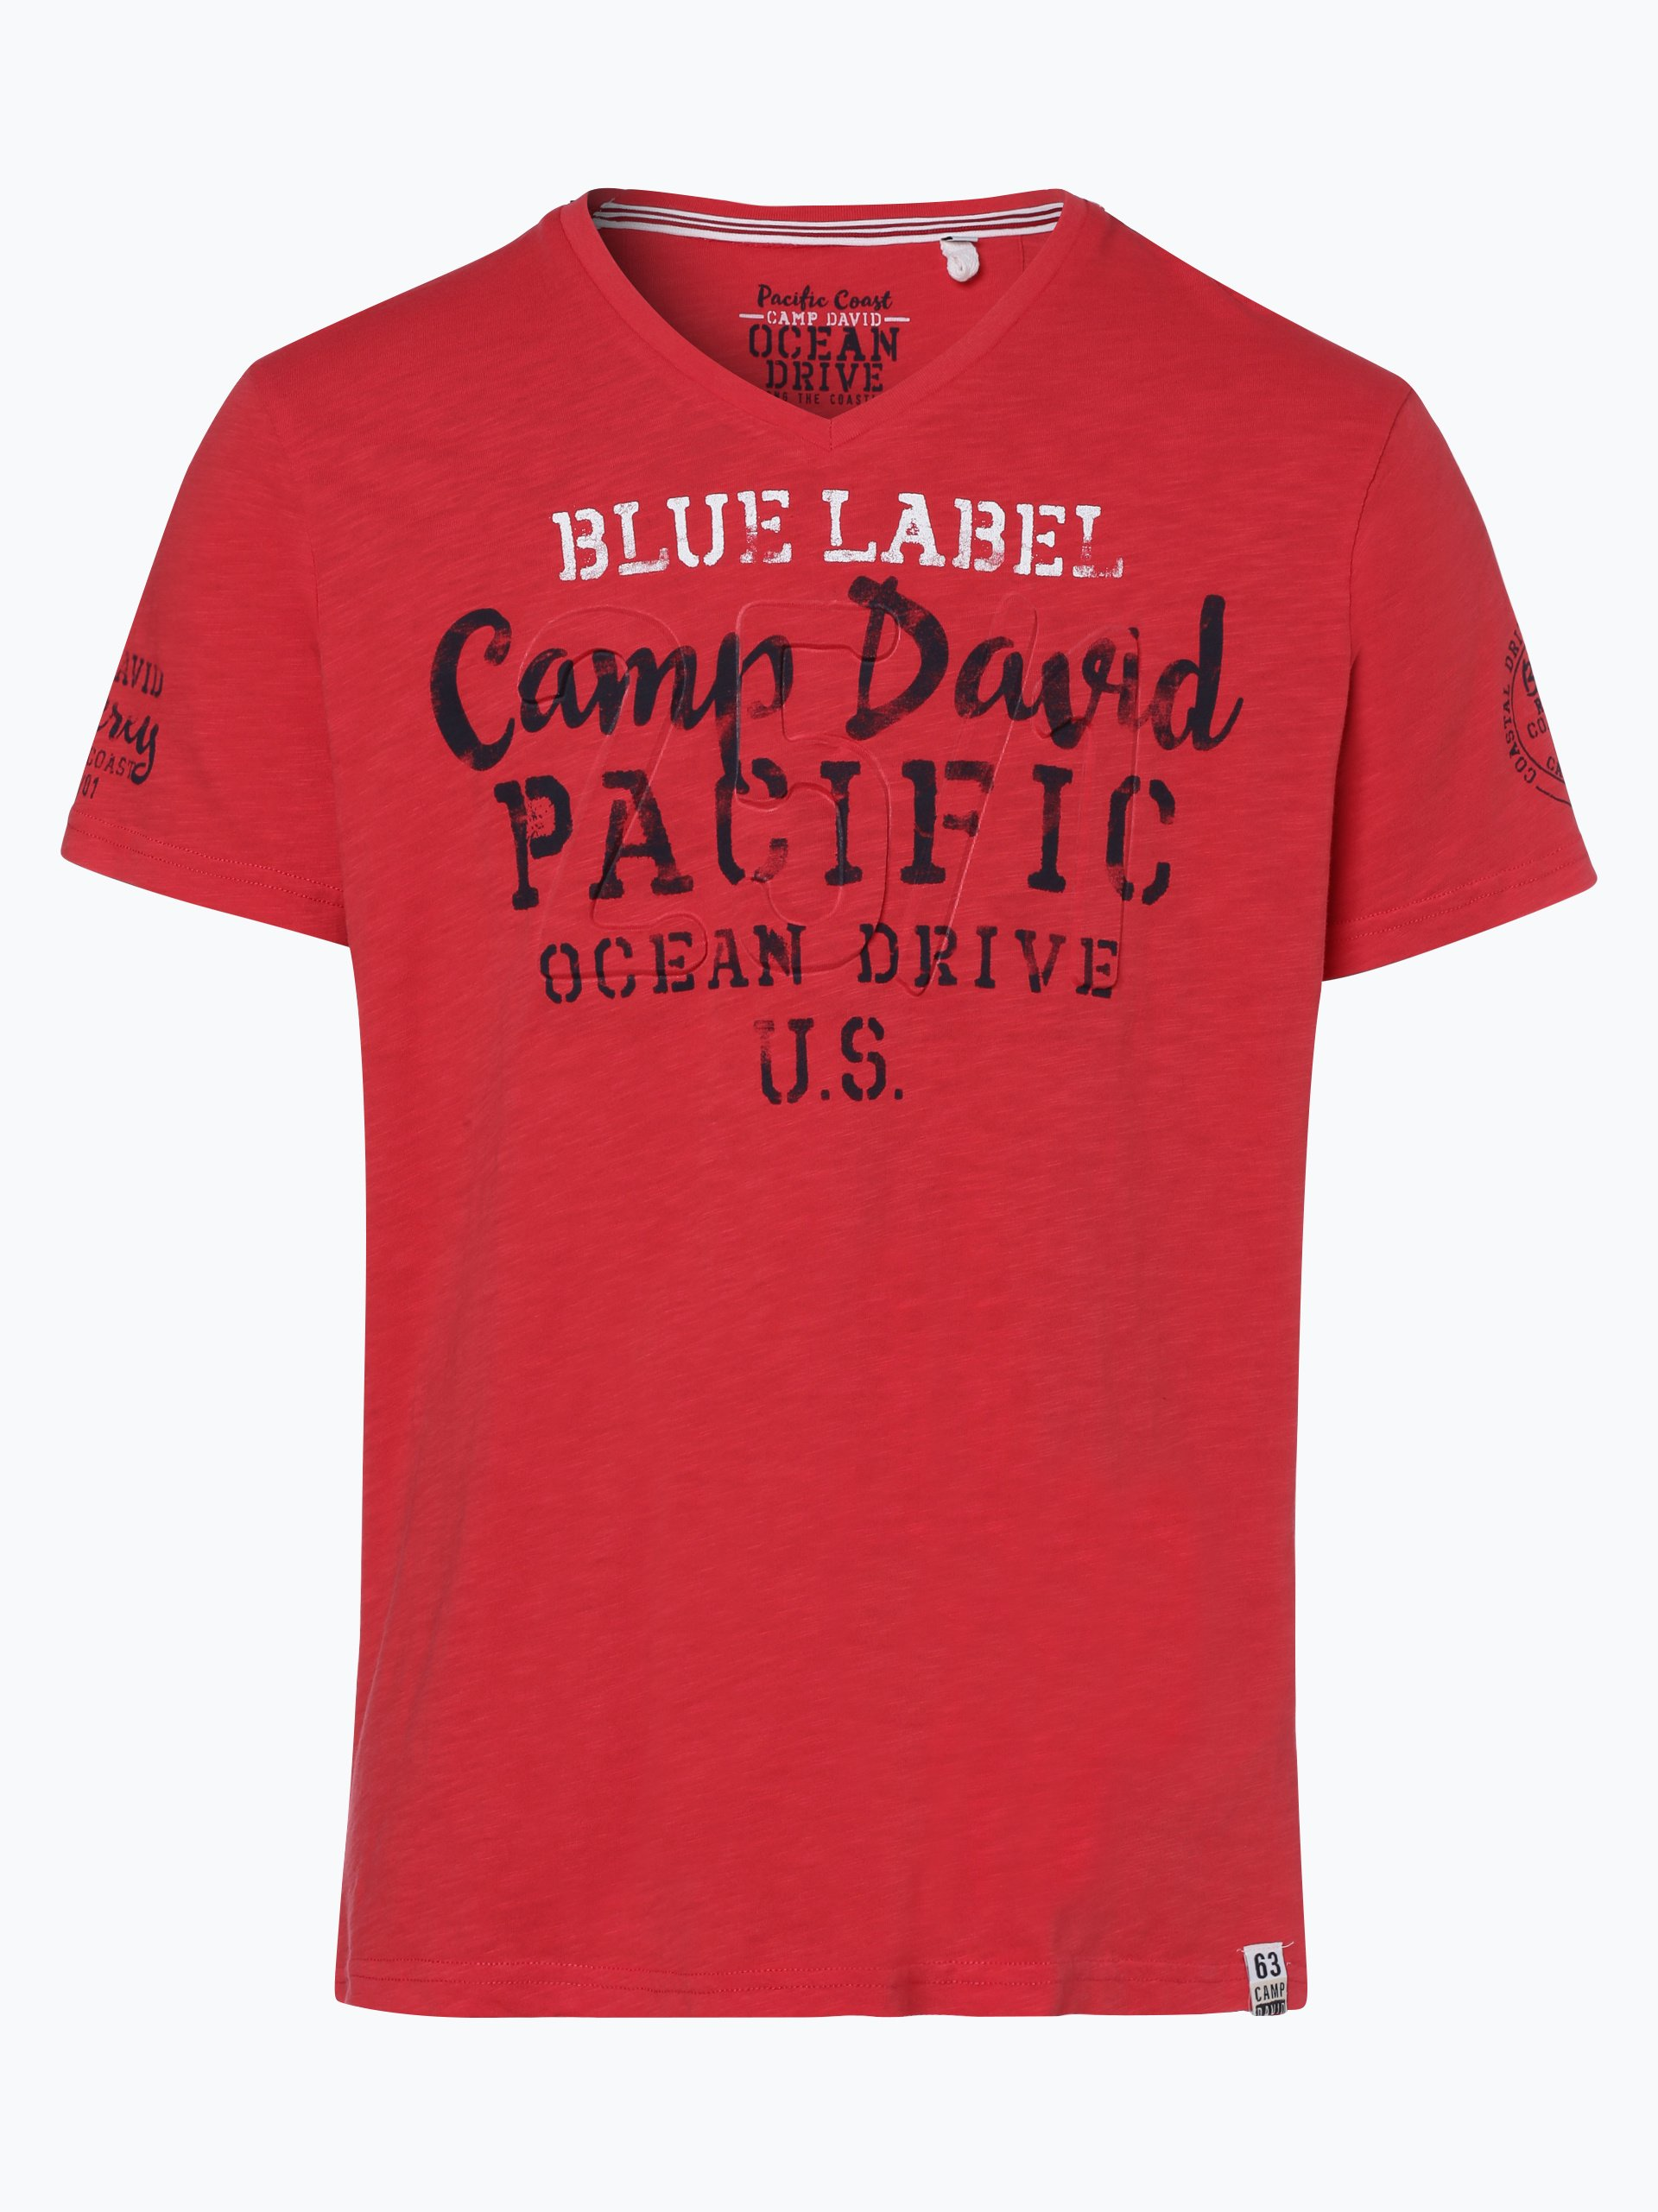 camp david herren t shirt rot bedruckt online kaufen vangraaf com. Black Bedroom Furniture Sets. Home Design Ideas